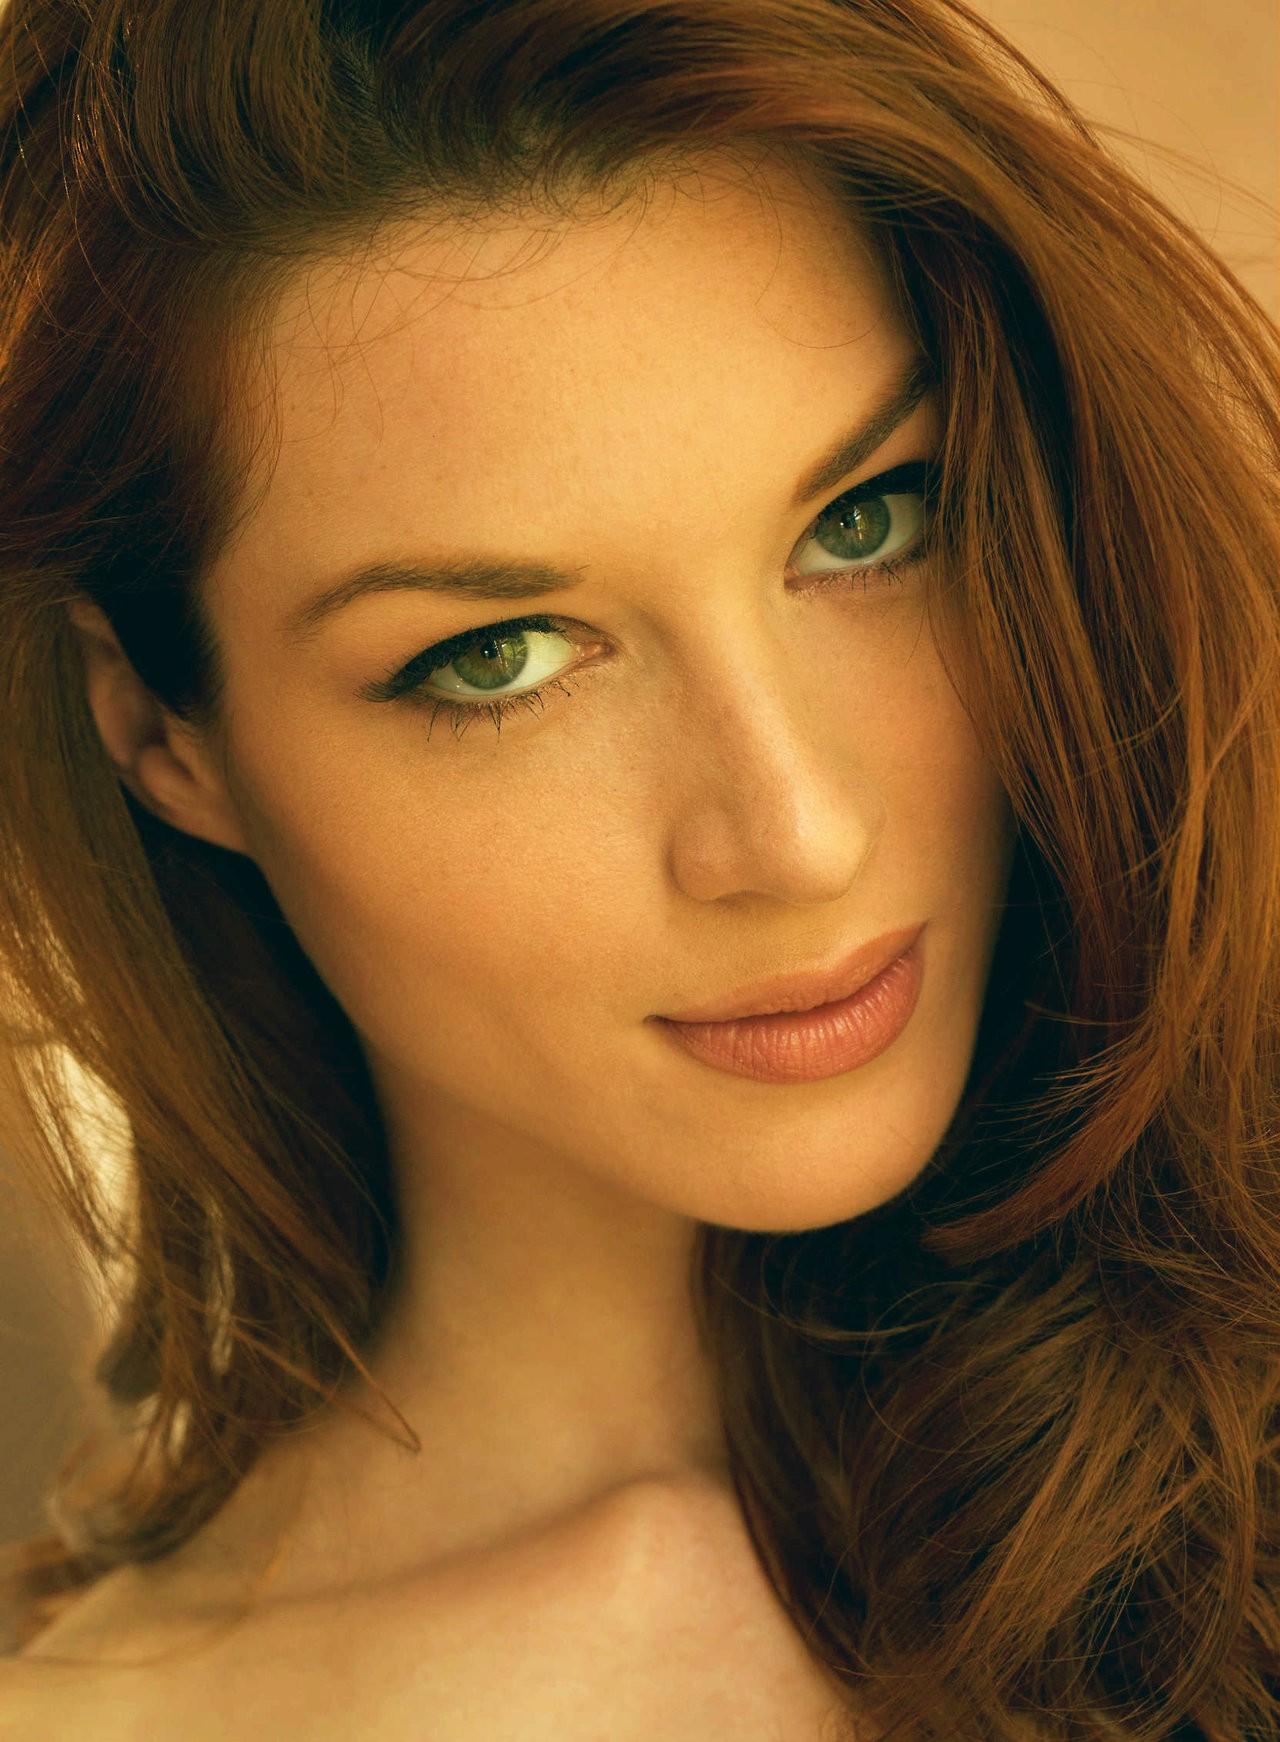 People 1280x1742 women model redhead long hair pornstar portrait display looking at viewer face portrait green eyes Stoya